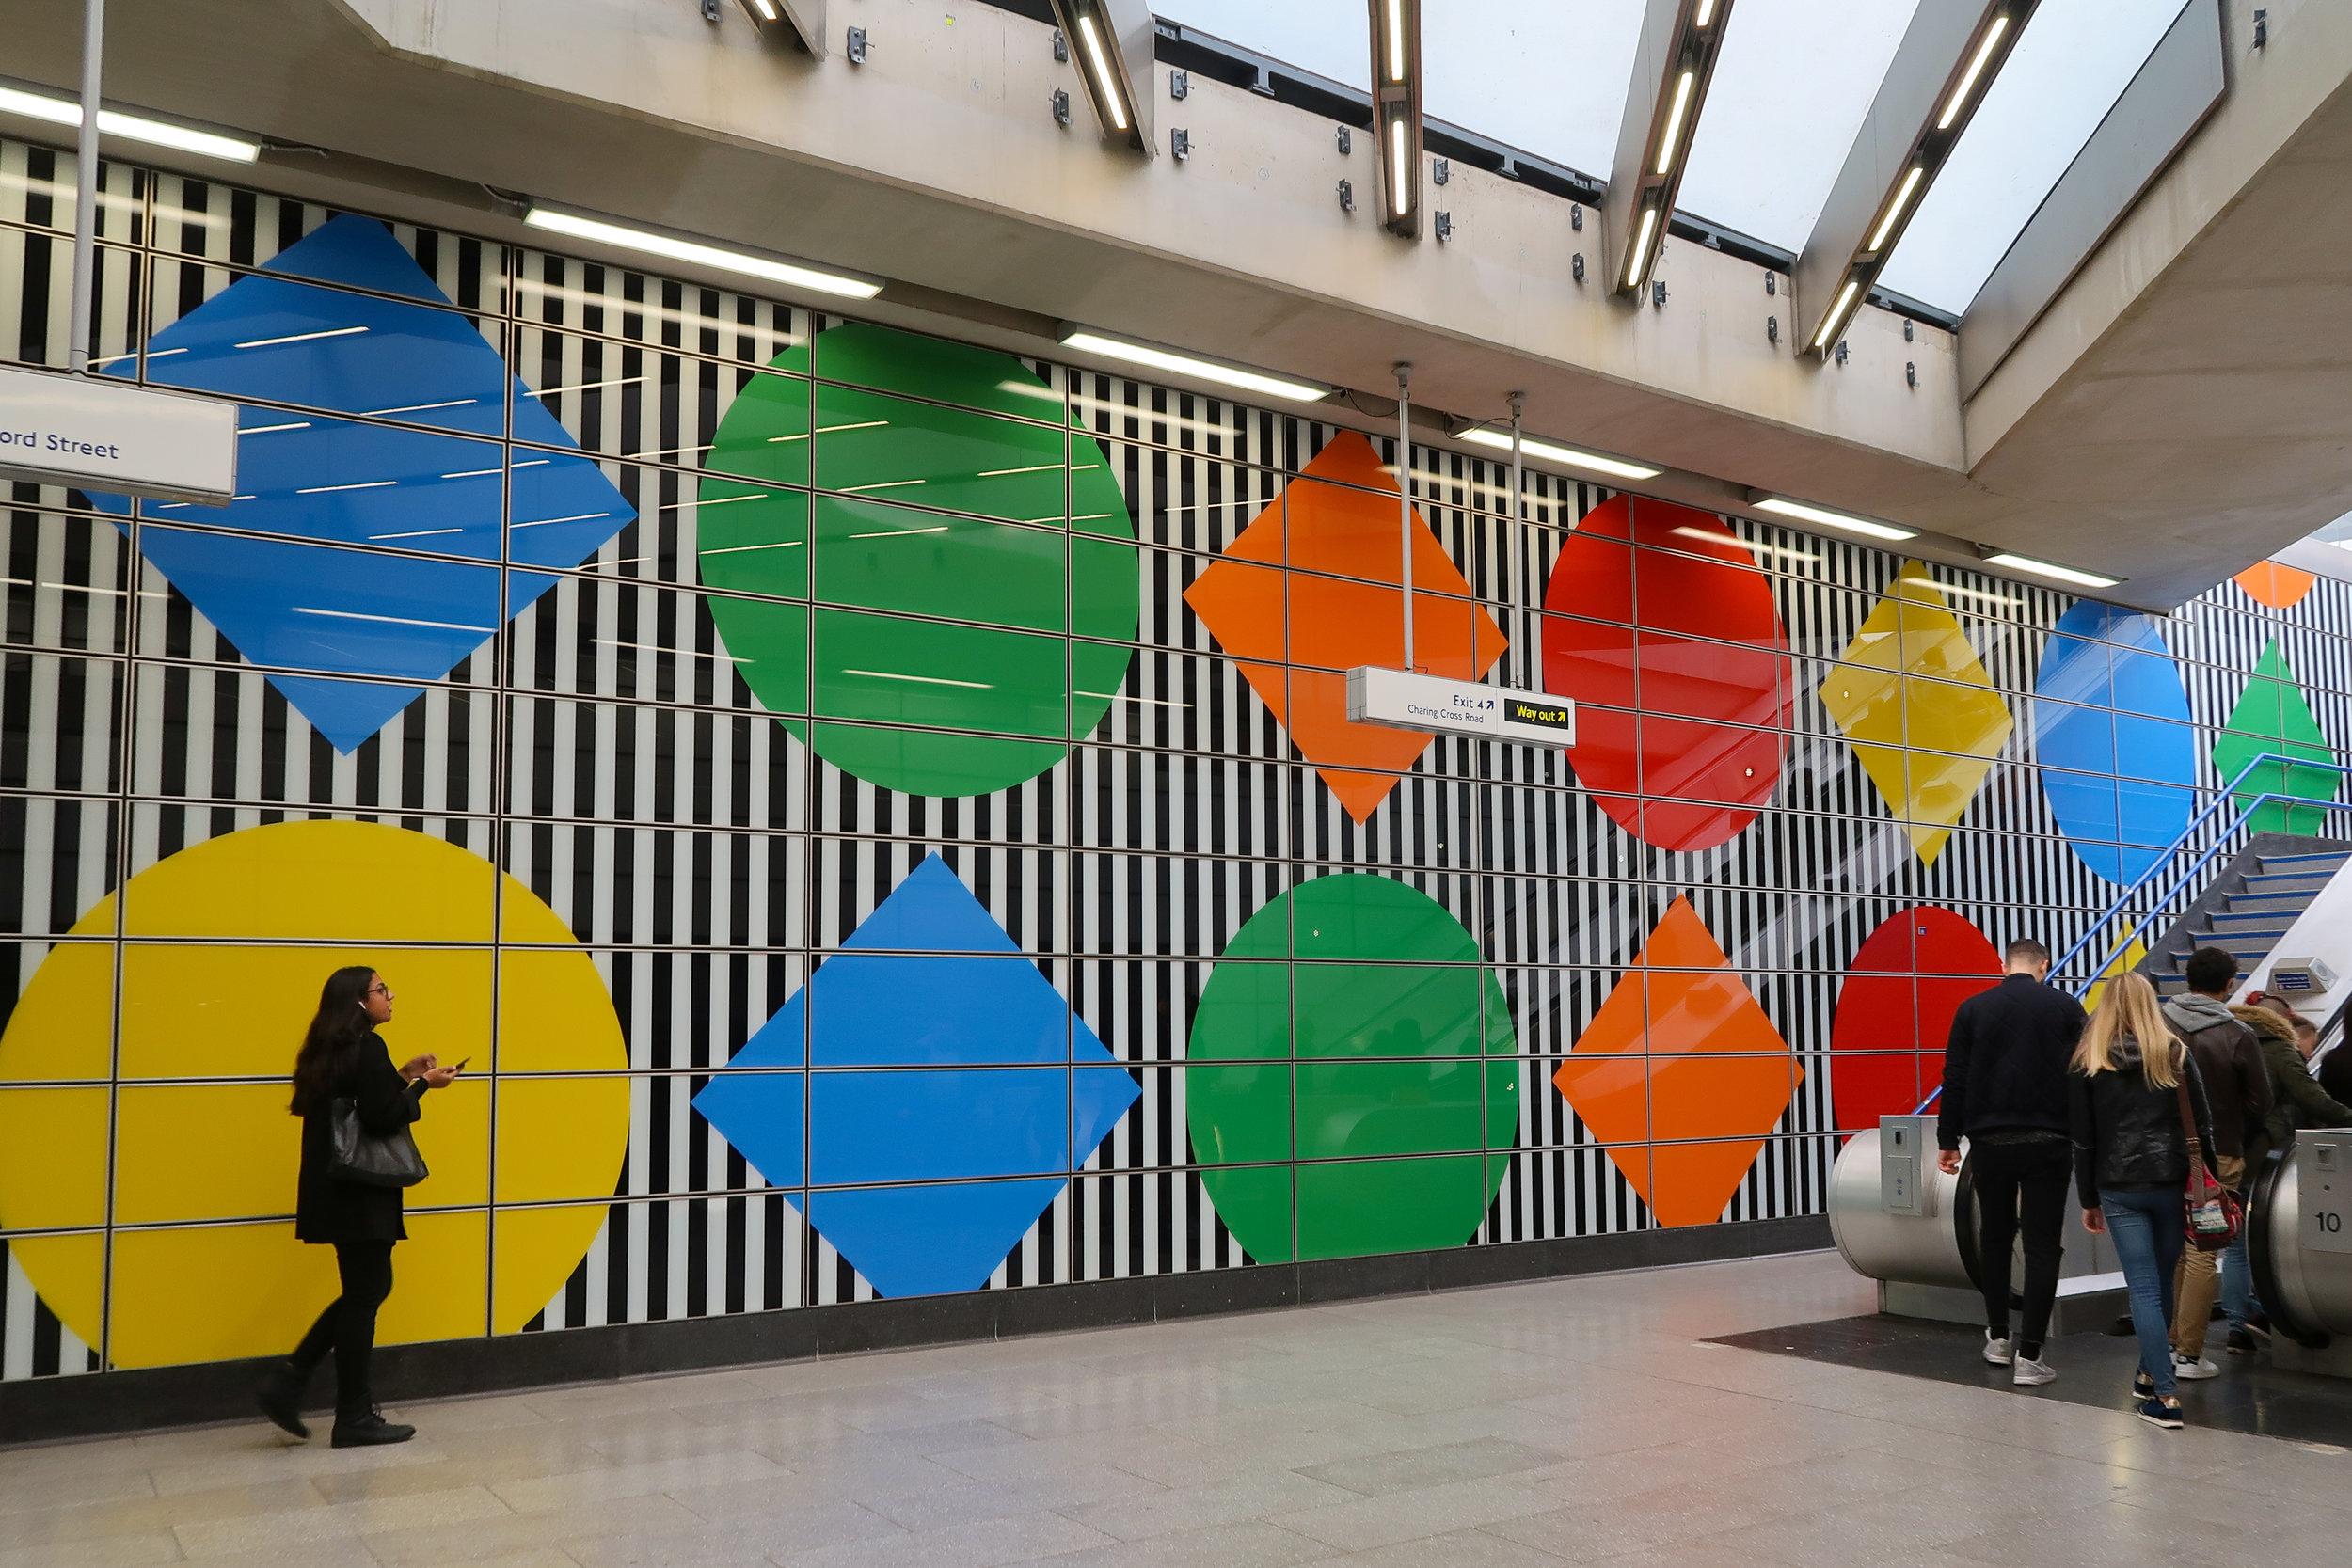 Tottenham Court Road station_c_Daphne Ronse